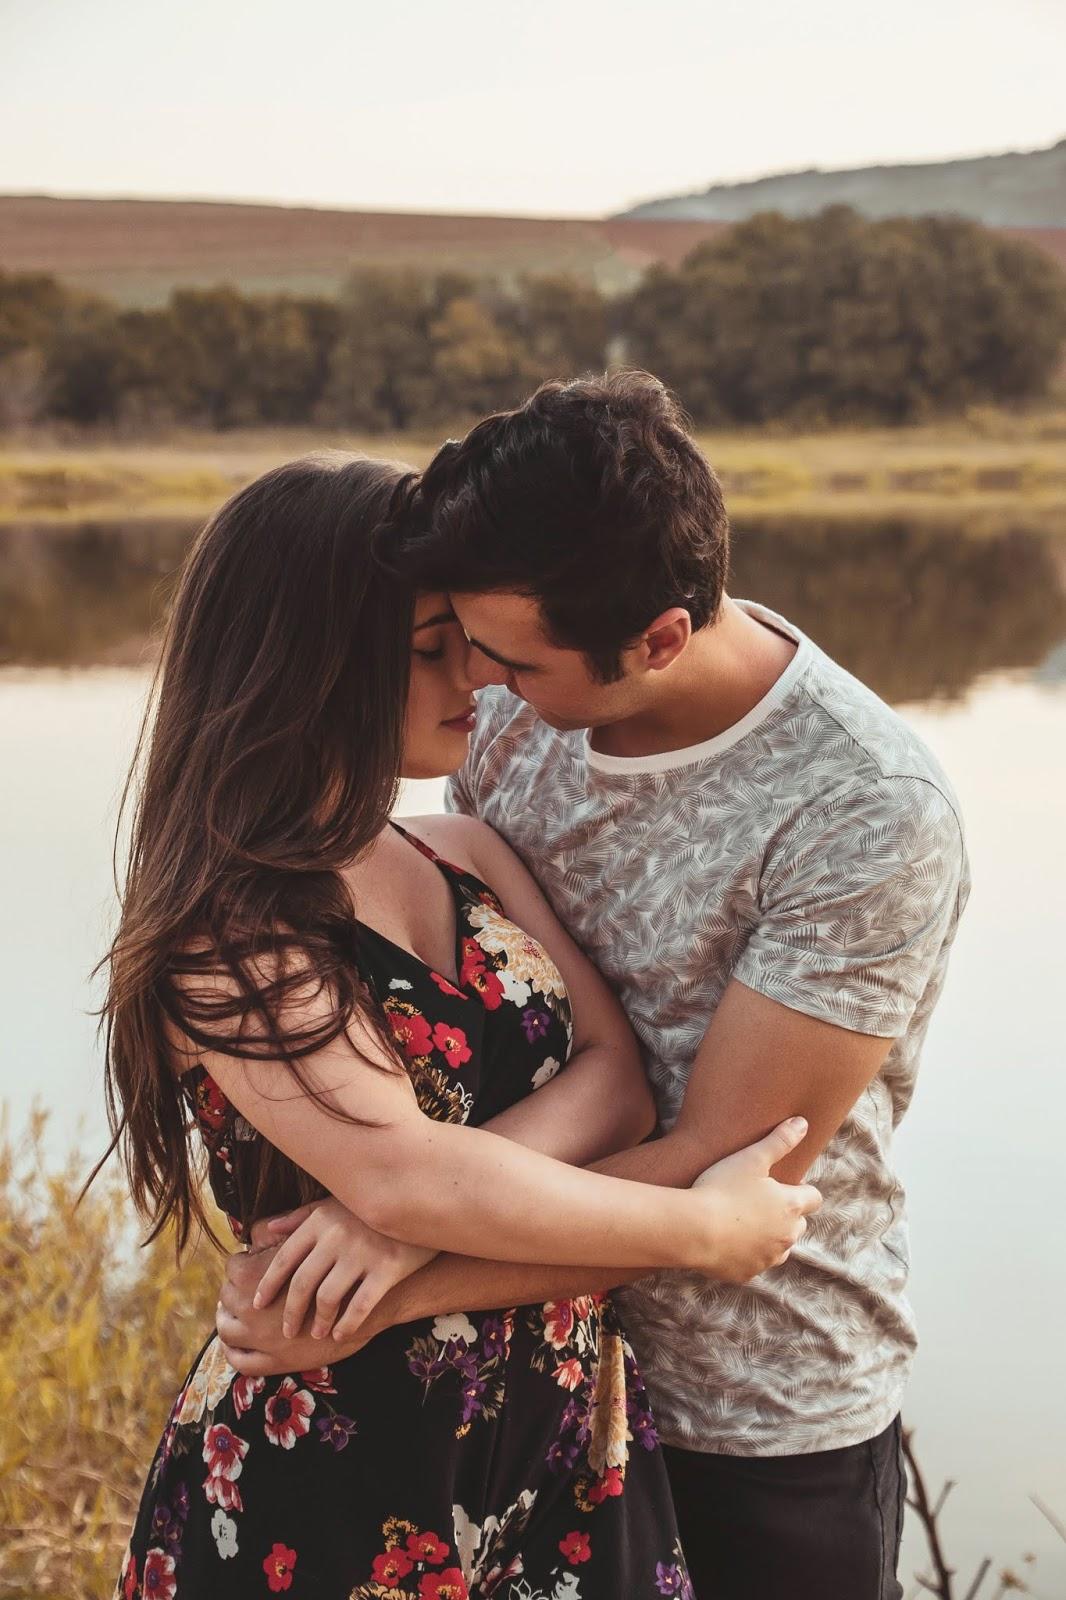 Romantic Whatsapp Status Video Free Downloads